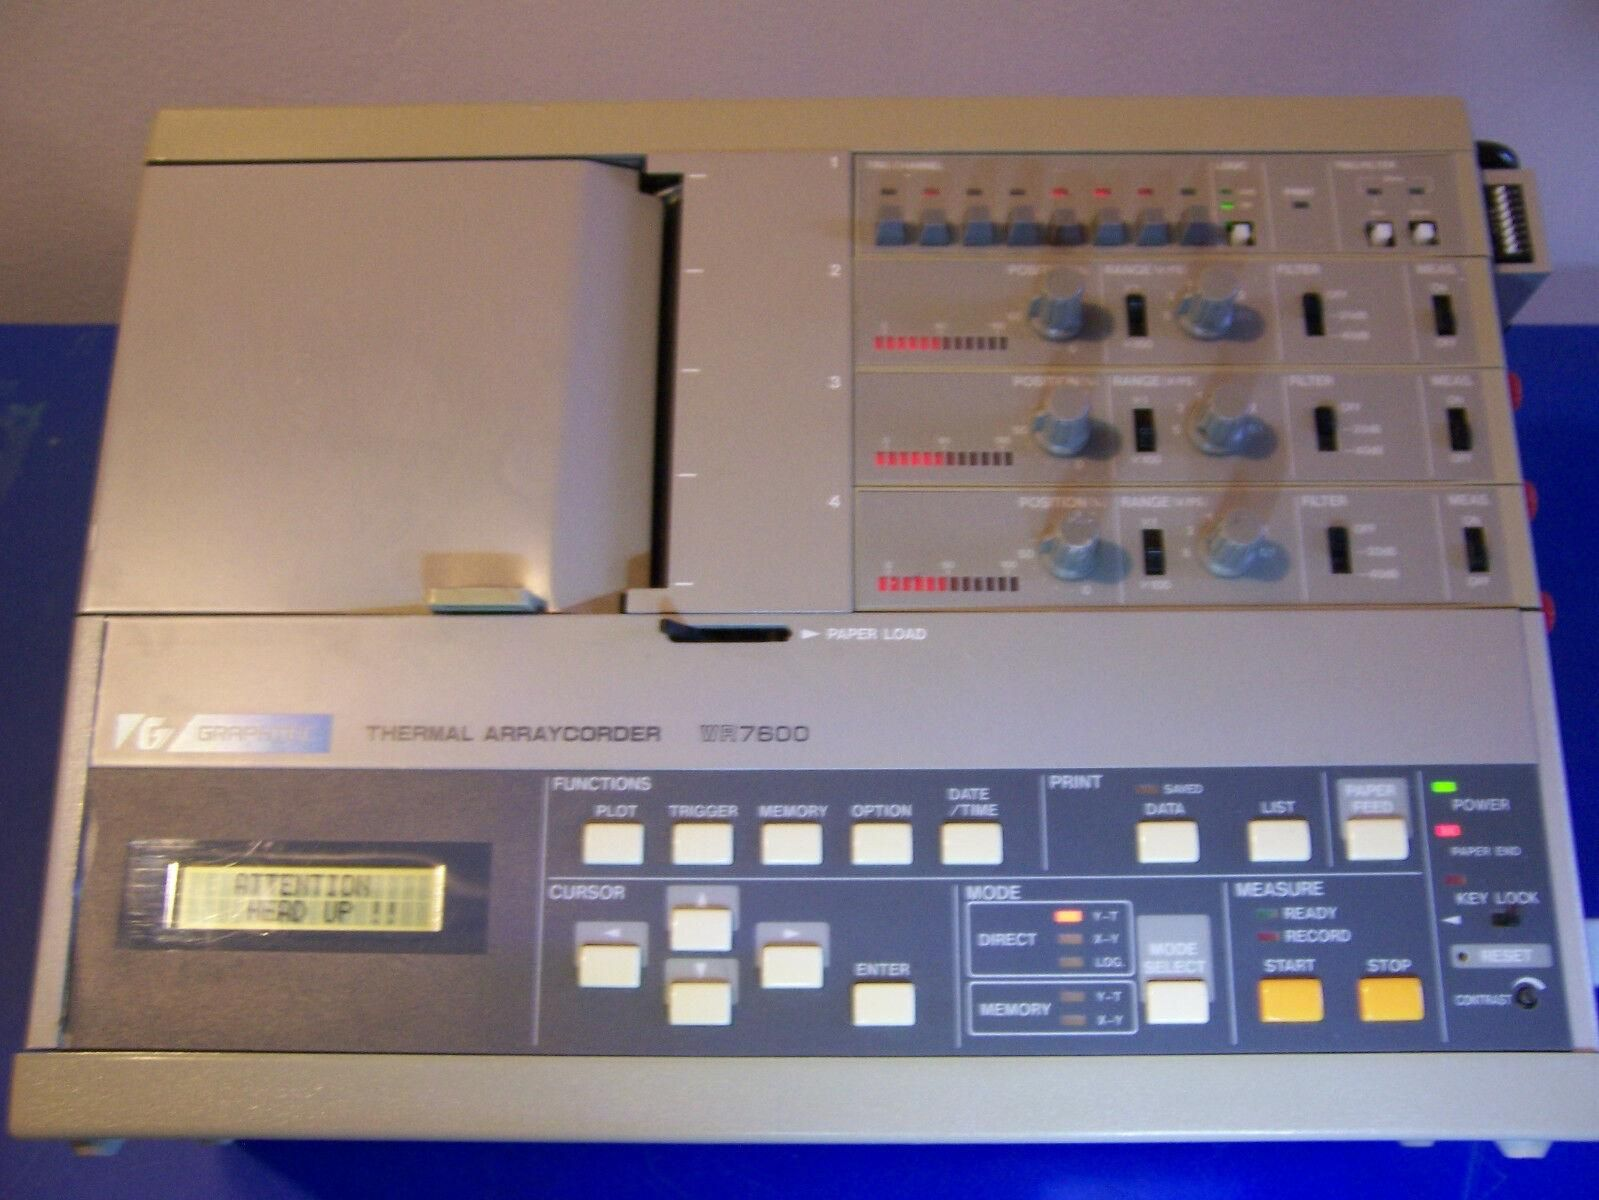 10534 GRAPHTEC WR7600 THERMAL ARRAYCORDER Digital Data Logger Chart Recorder